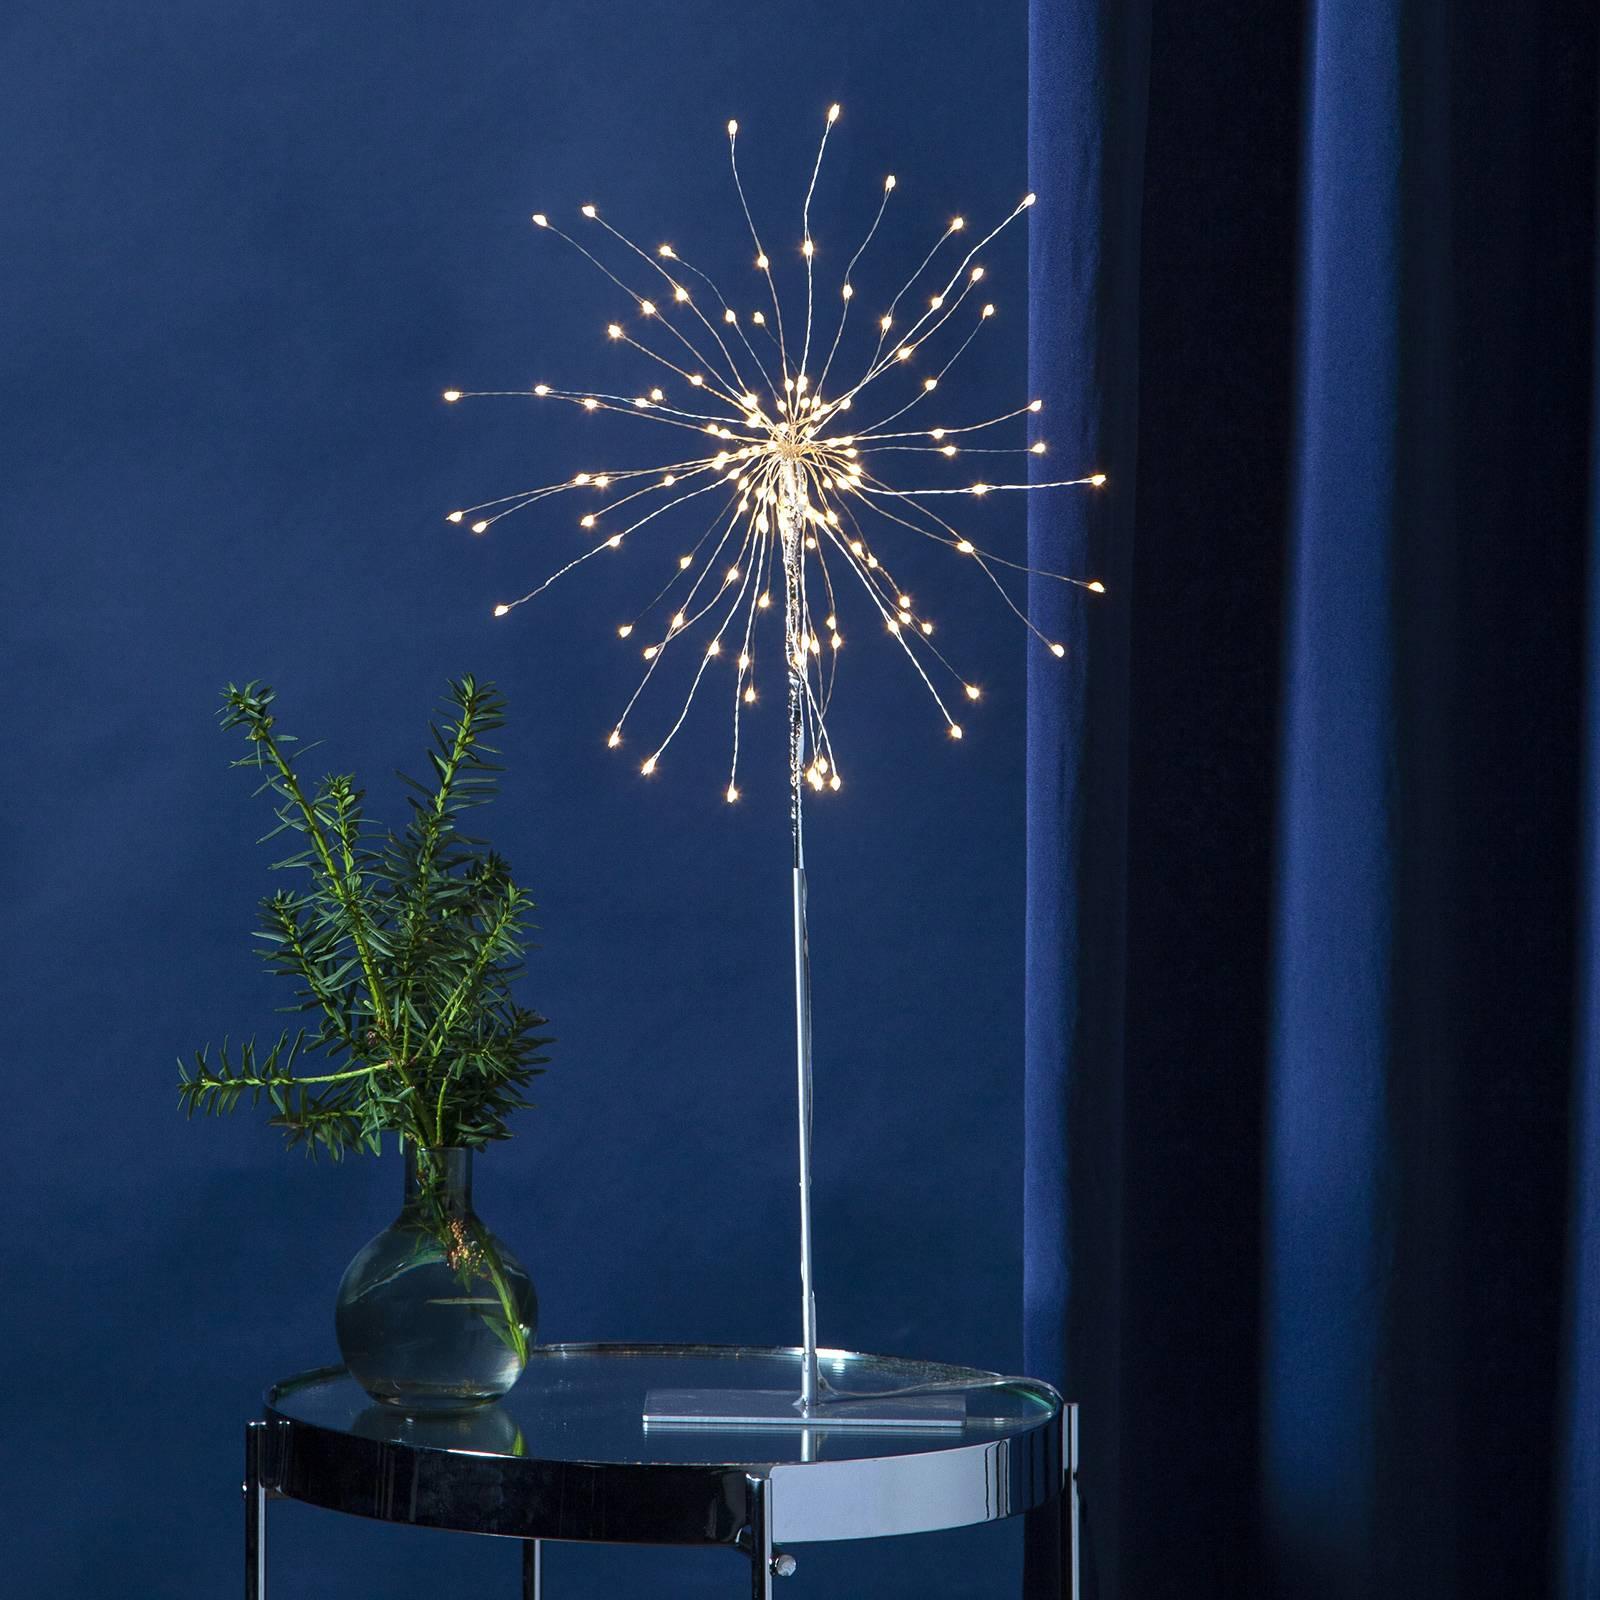 LED-koristevalaisin Firework 3D, korkeus 50 cm